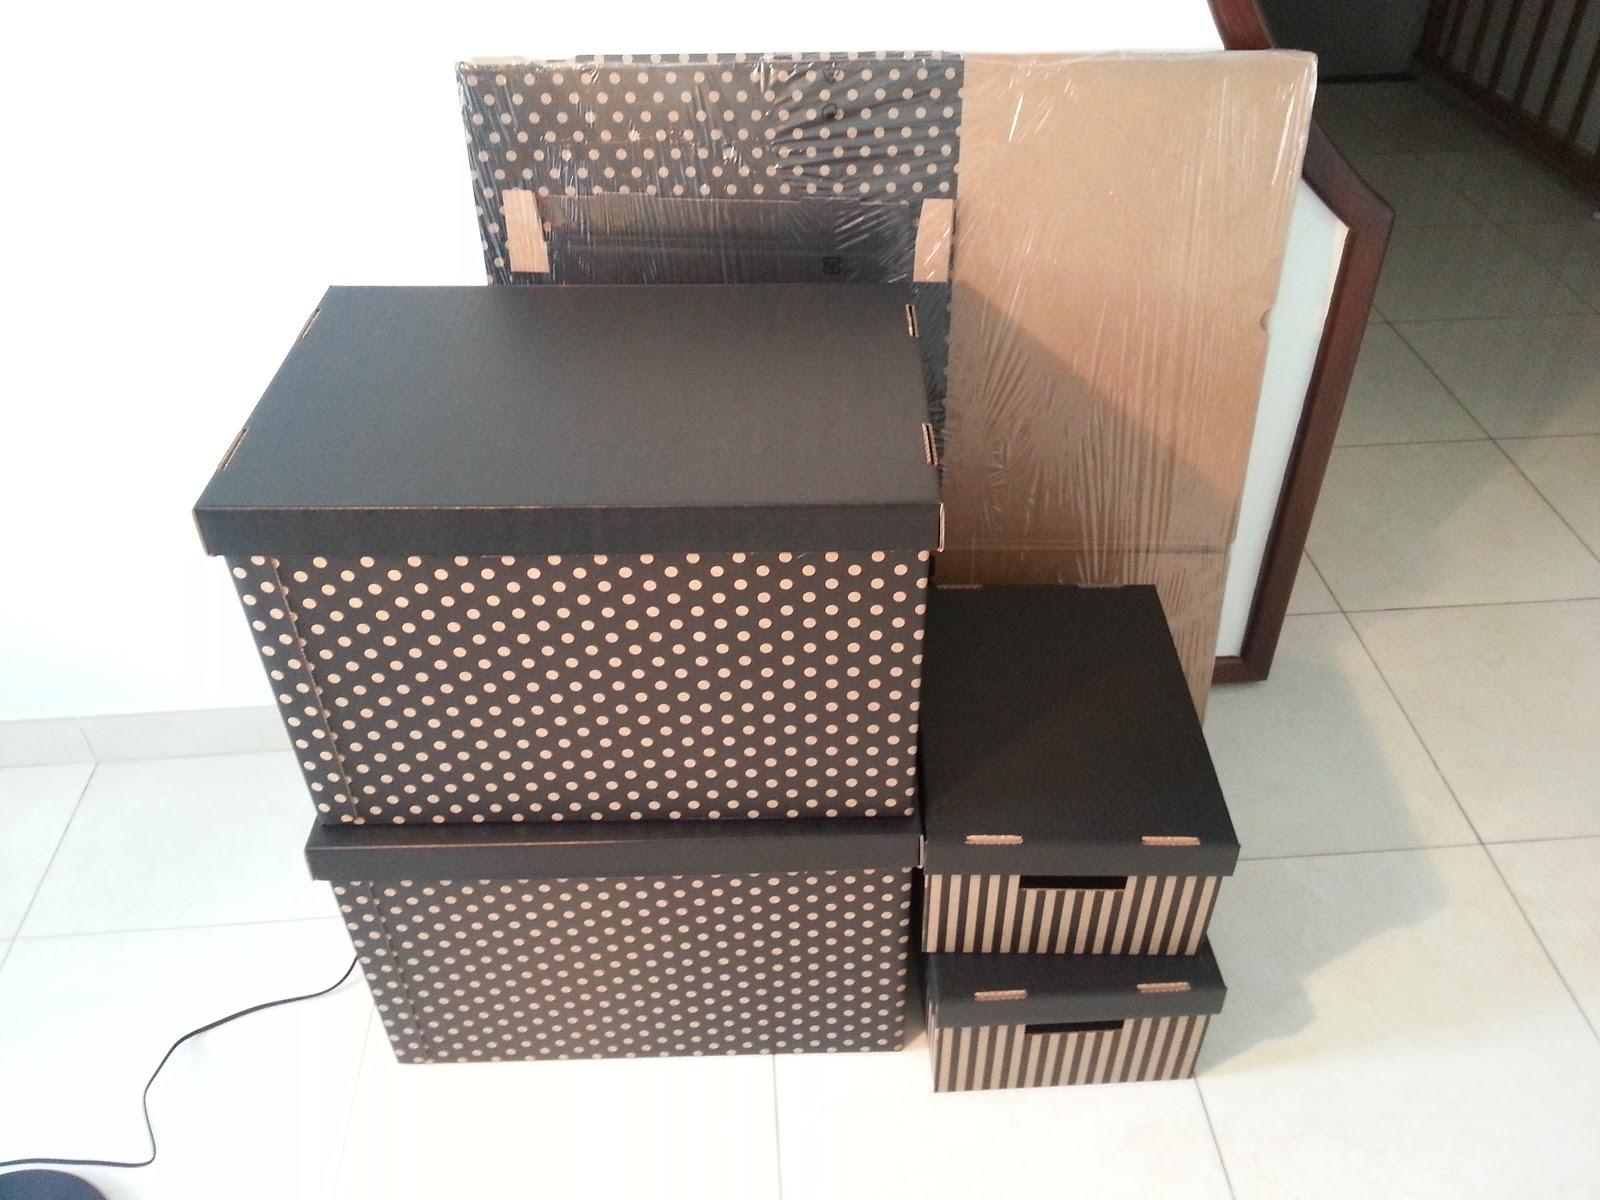 les lego de ludo ikea aime les lego. Black Bedroom Furniture Sets. Home Design Ideas